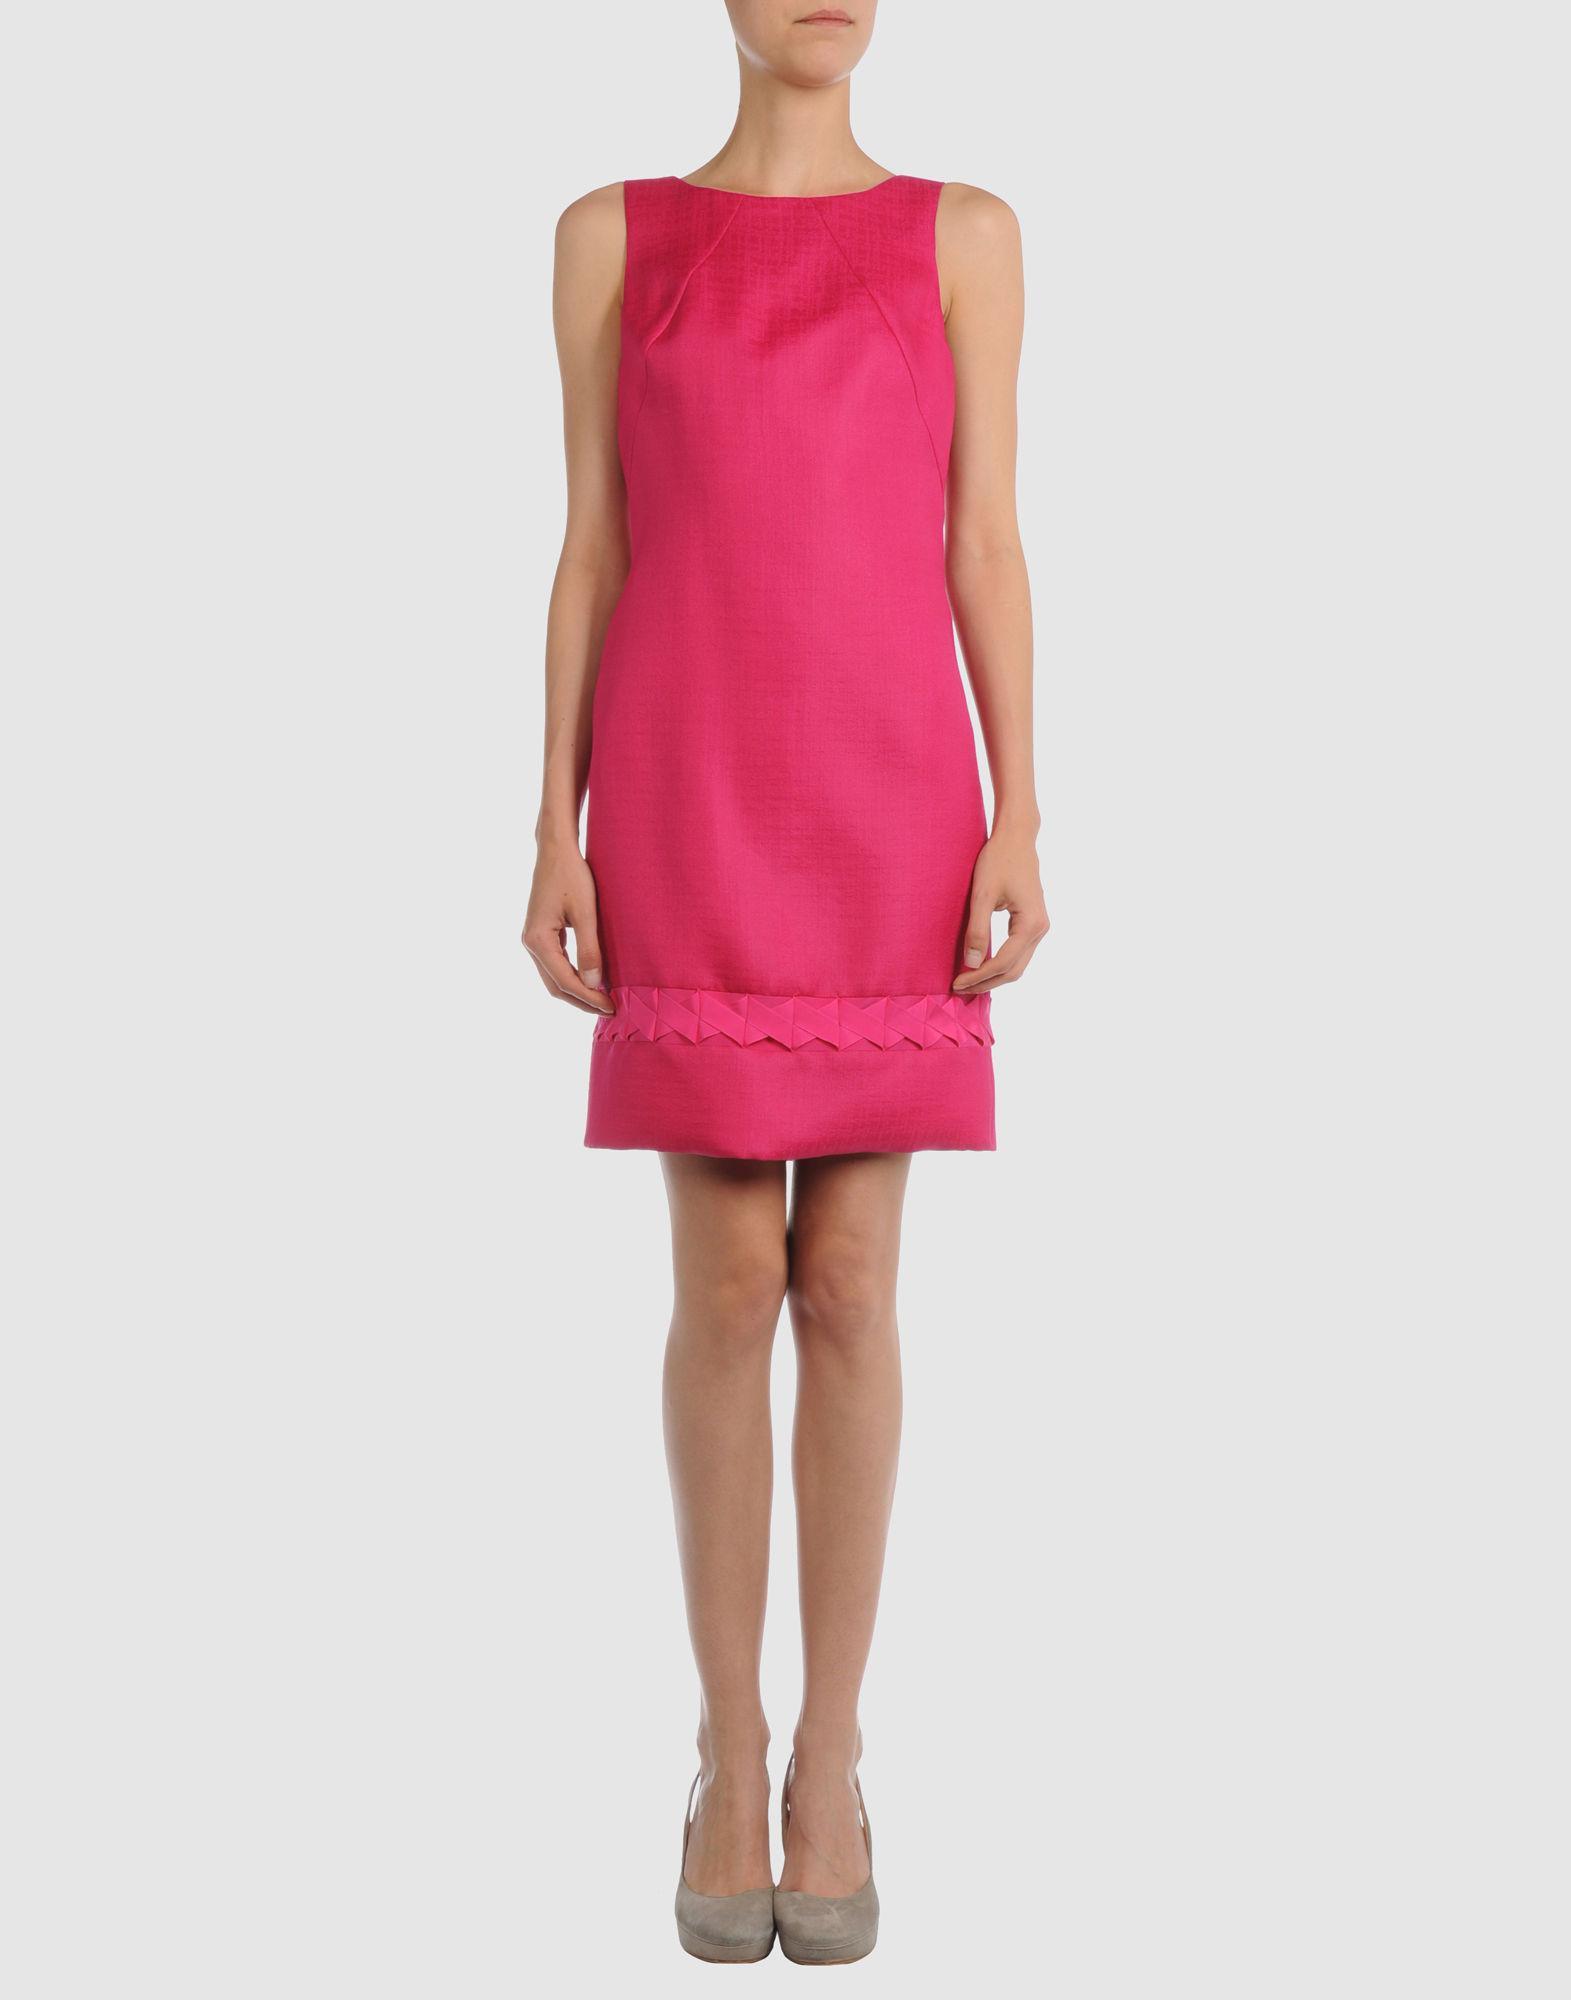 34215473SR 14 f - Evening Φορεματα Versace 2011 2012 Κωδ.35